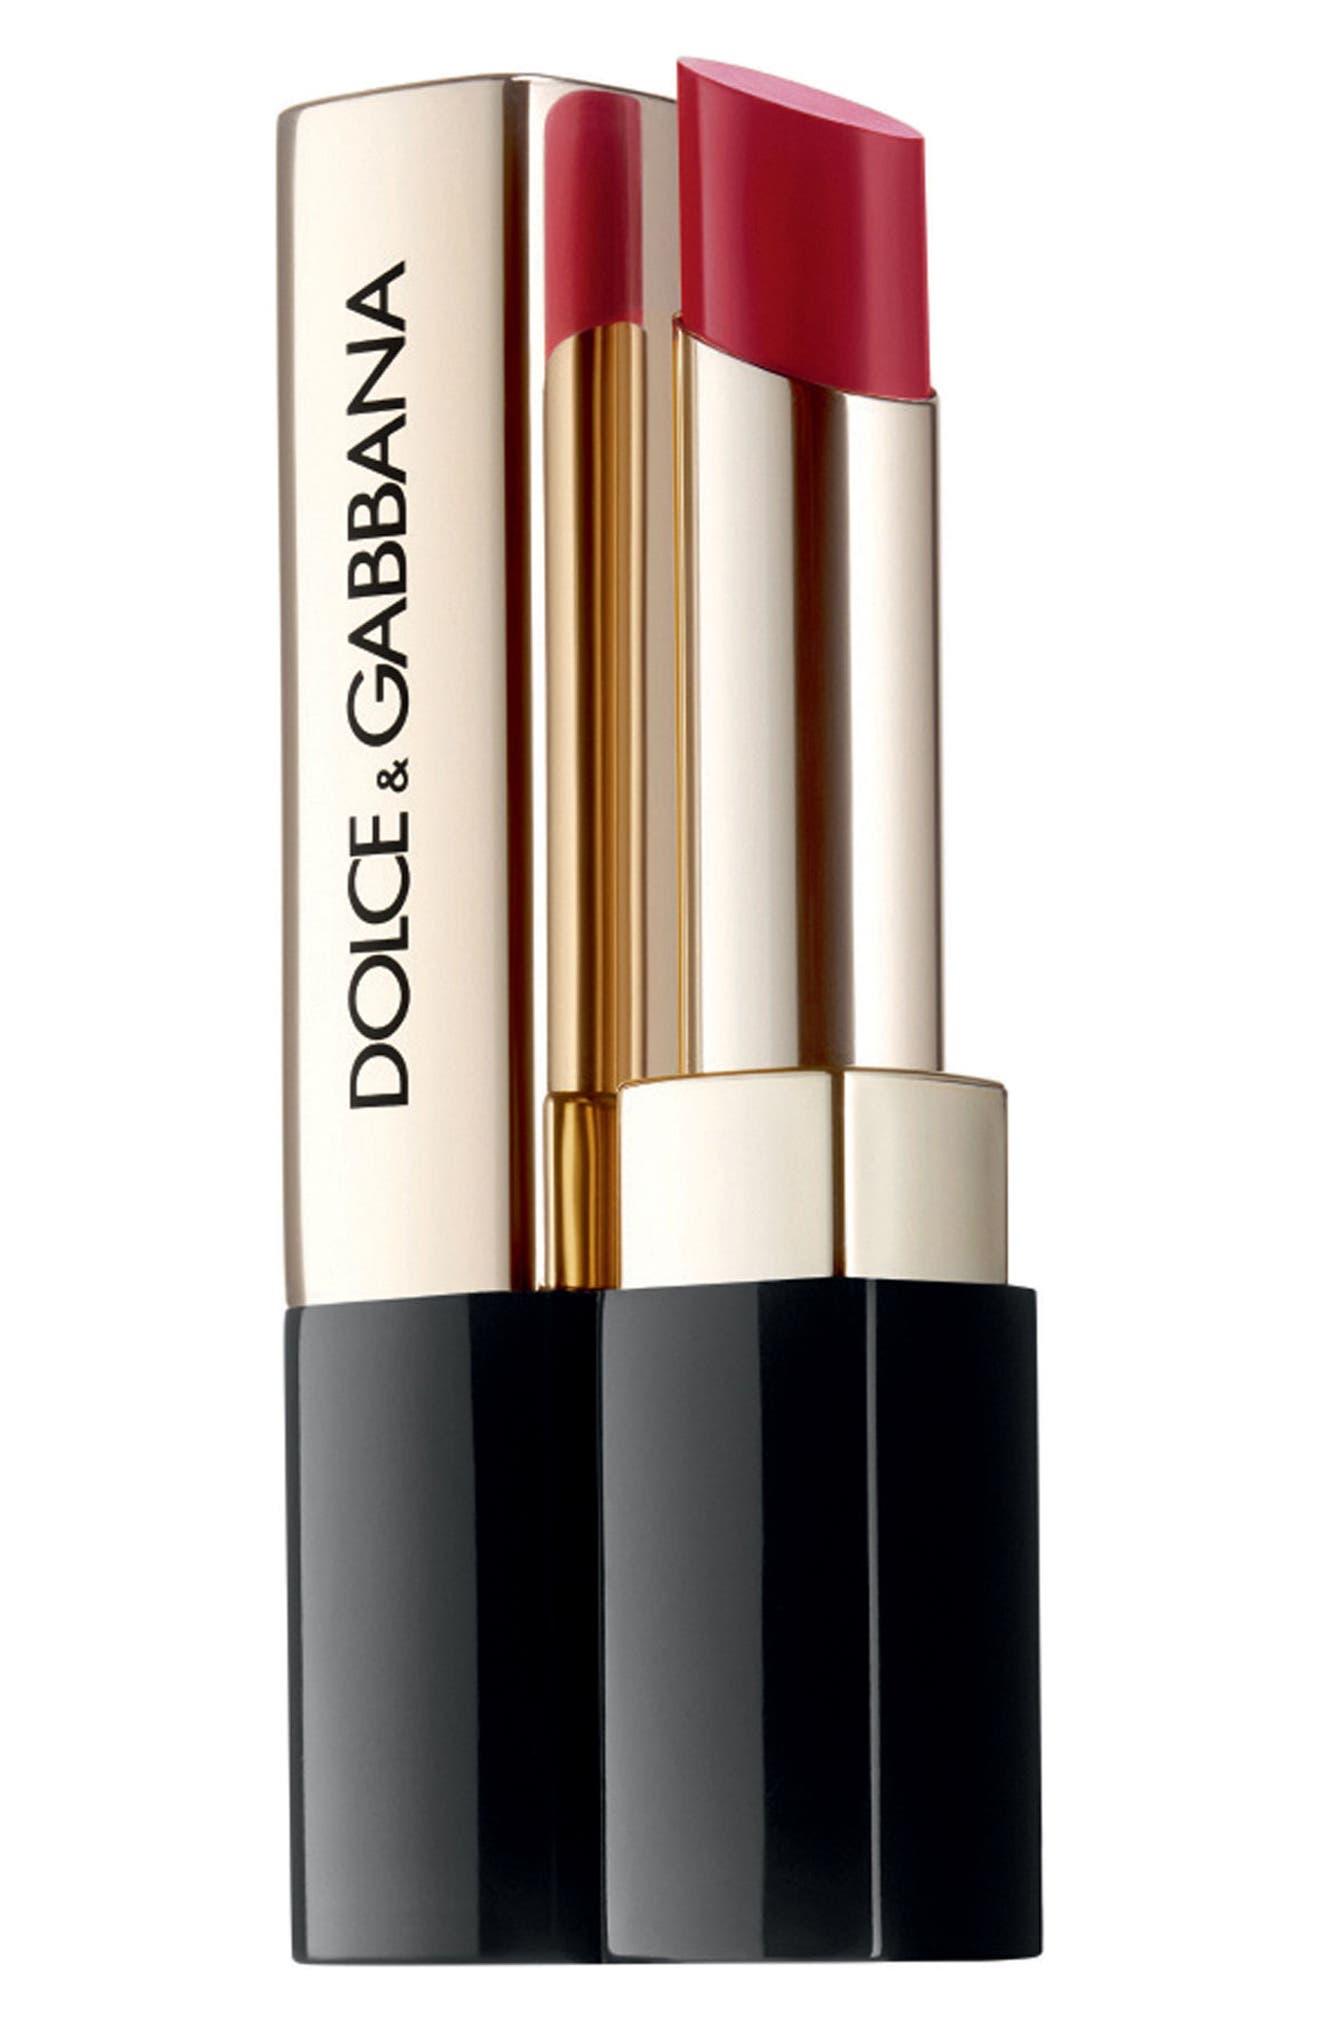 Dolce&Gabbana Beauty Miss Sicily Colour & Care Lipstick